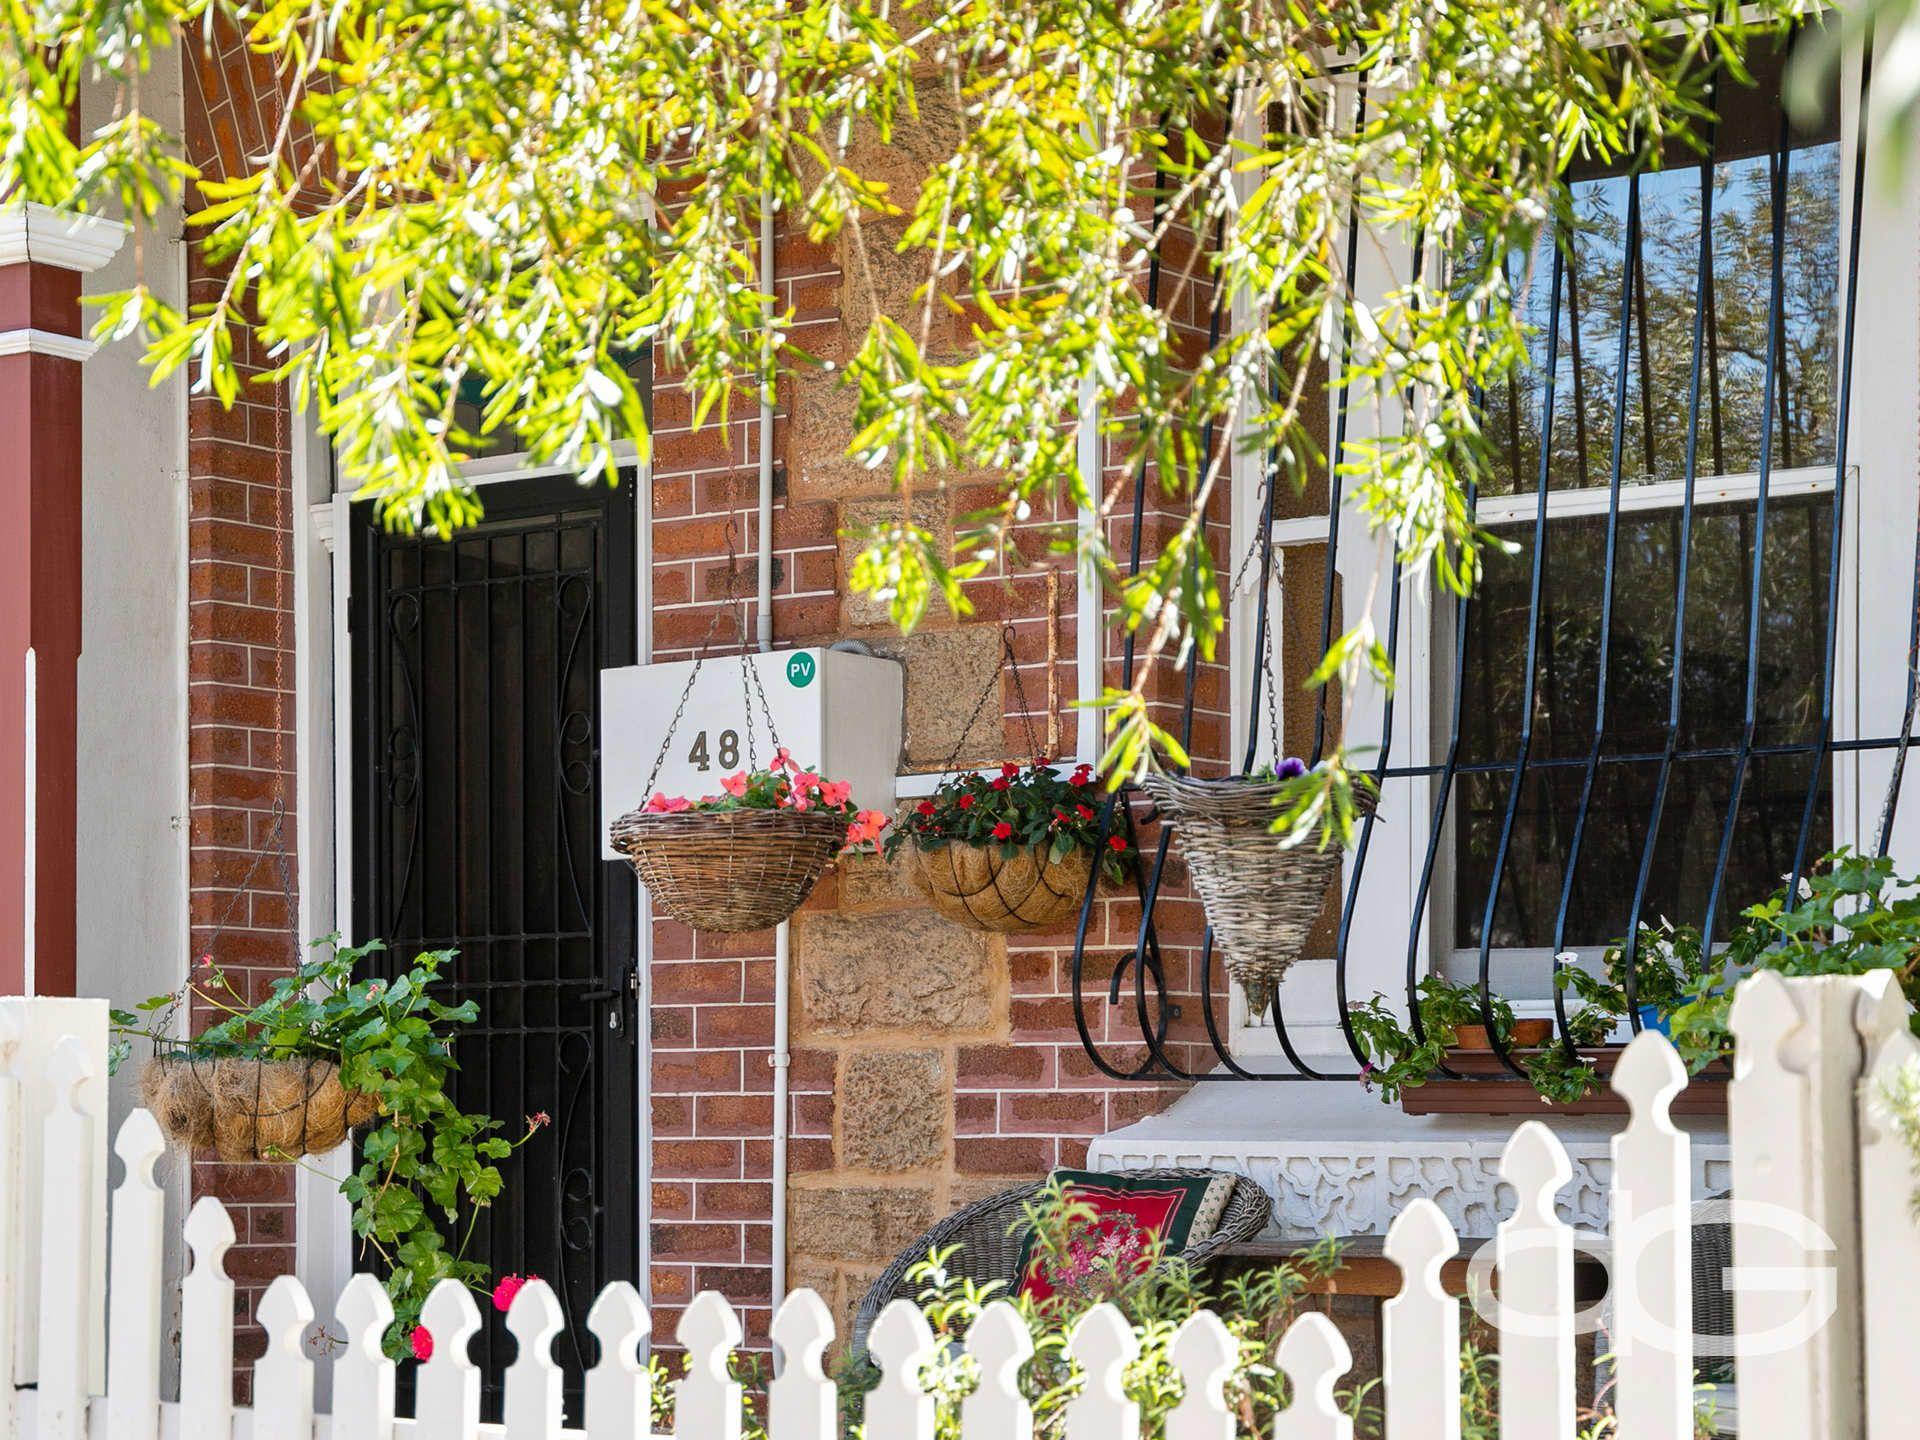 48 King Street, East Fremantle